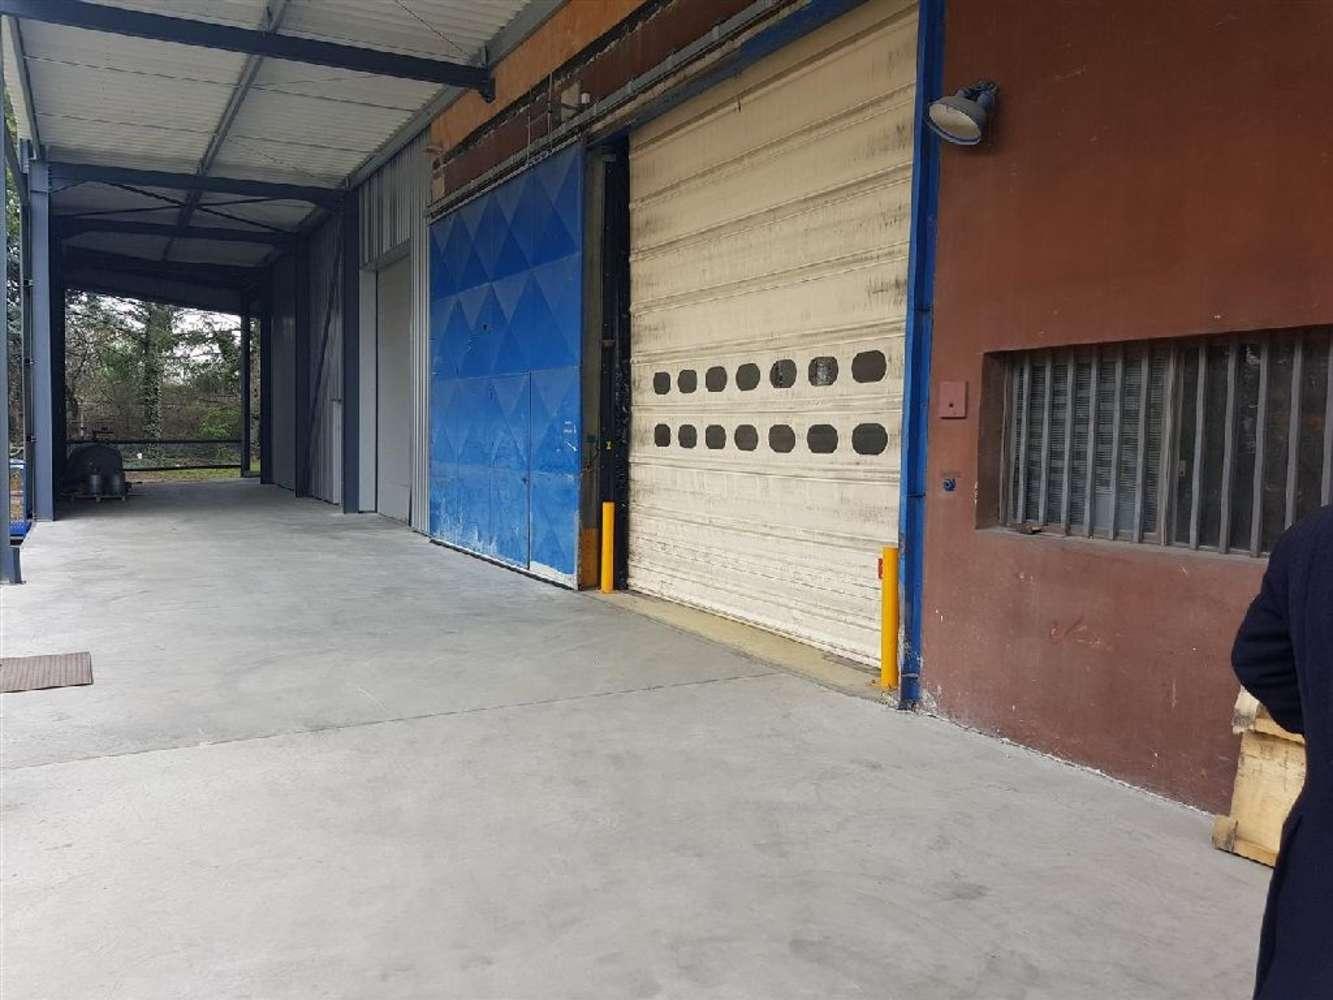 Activités/entrepôt Brignais, 69530 - Location entrepot Brignais - Grand Lyon - 10029774